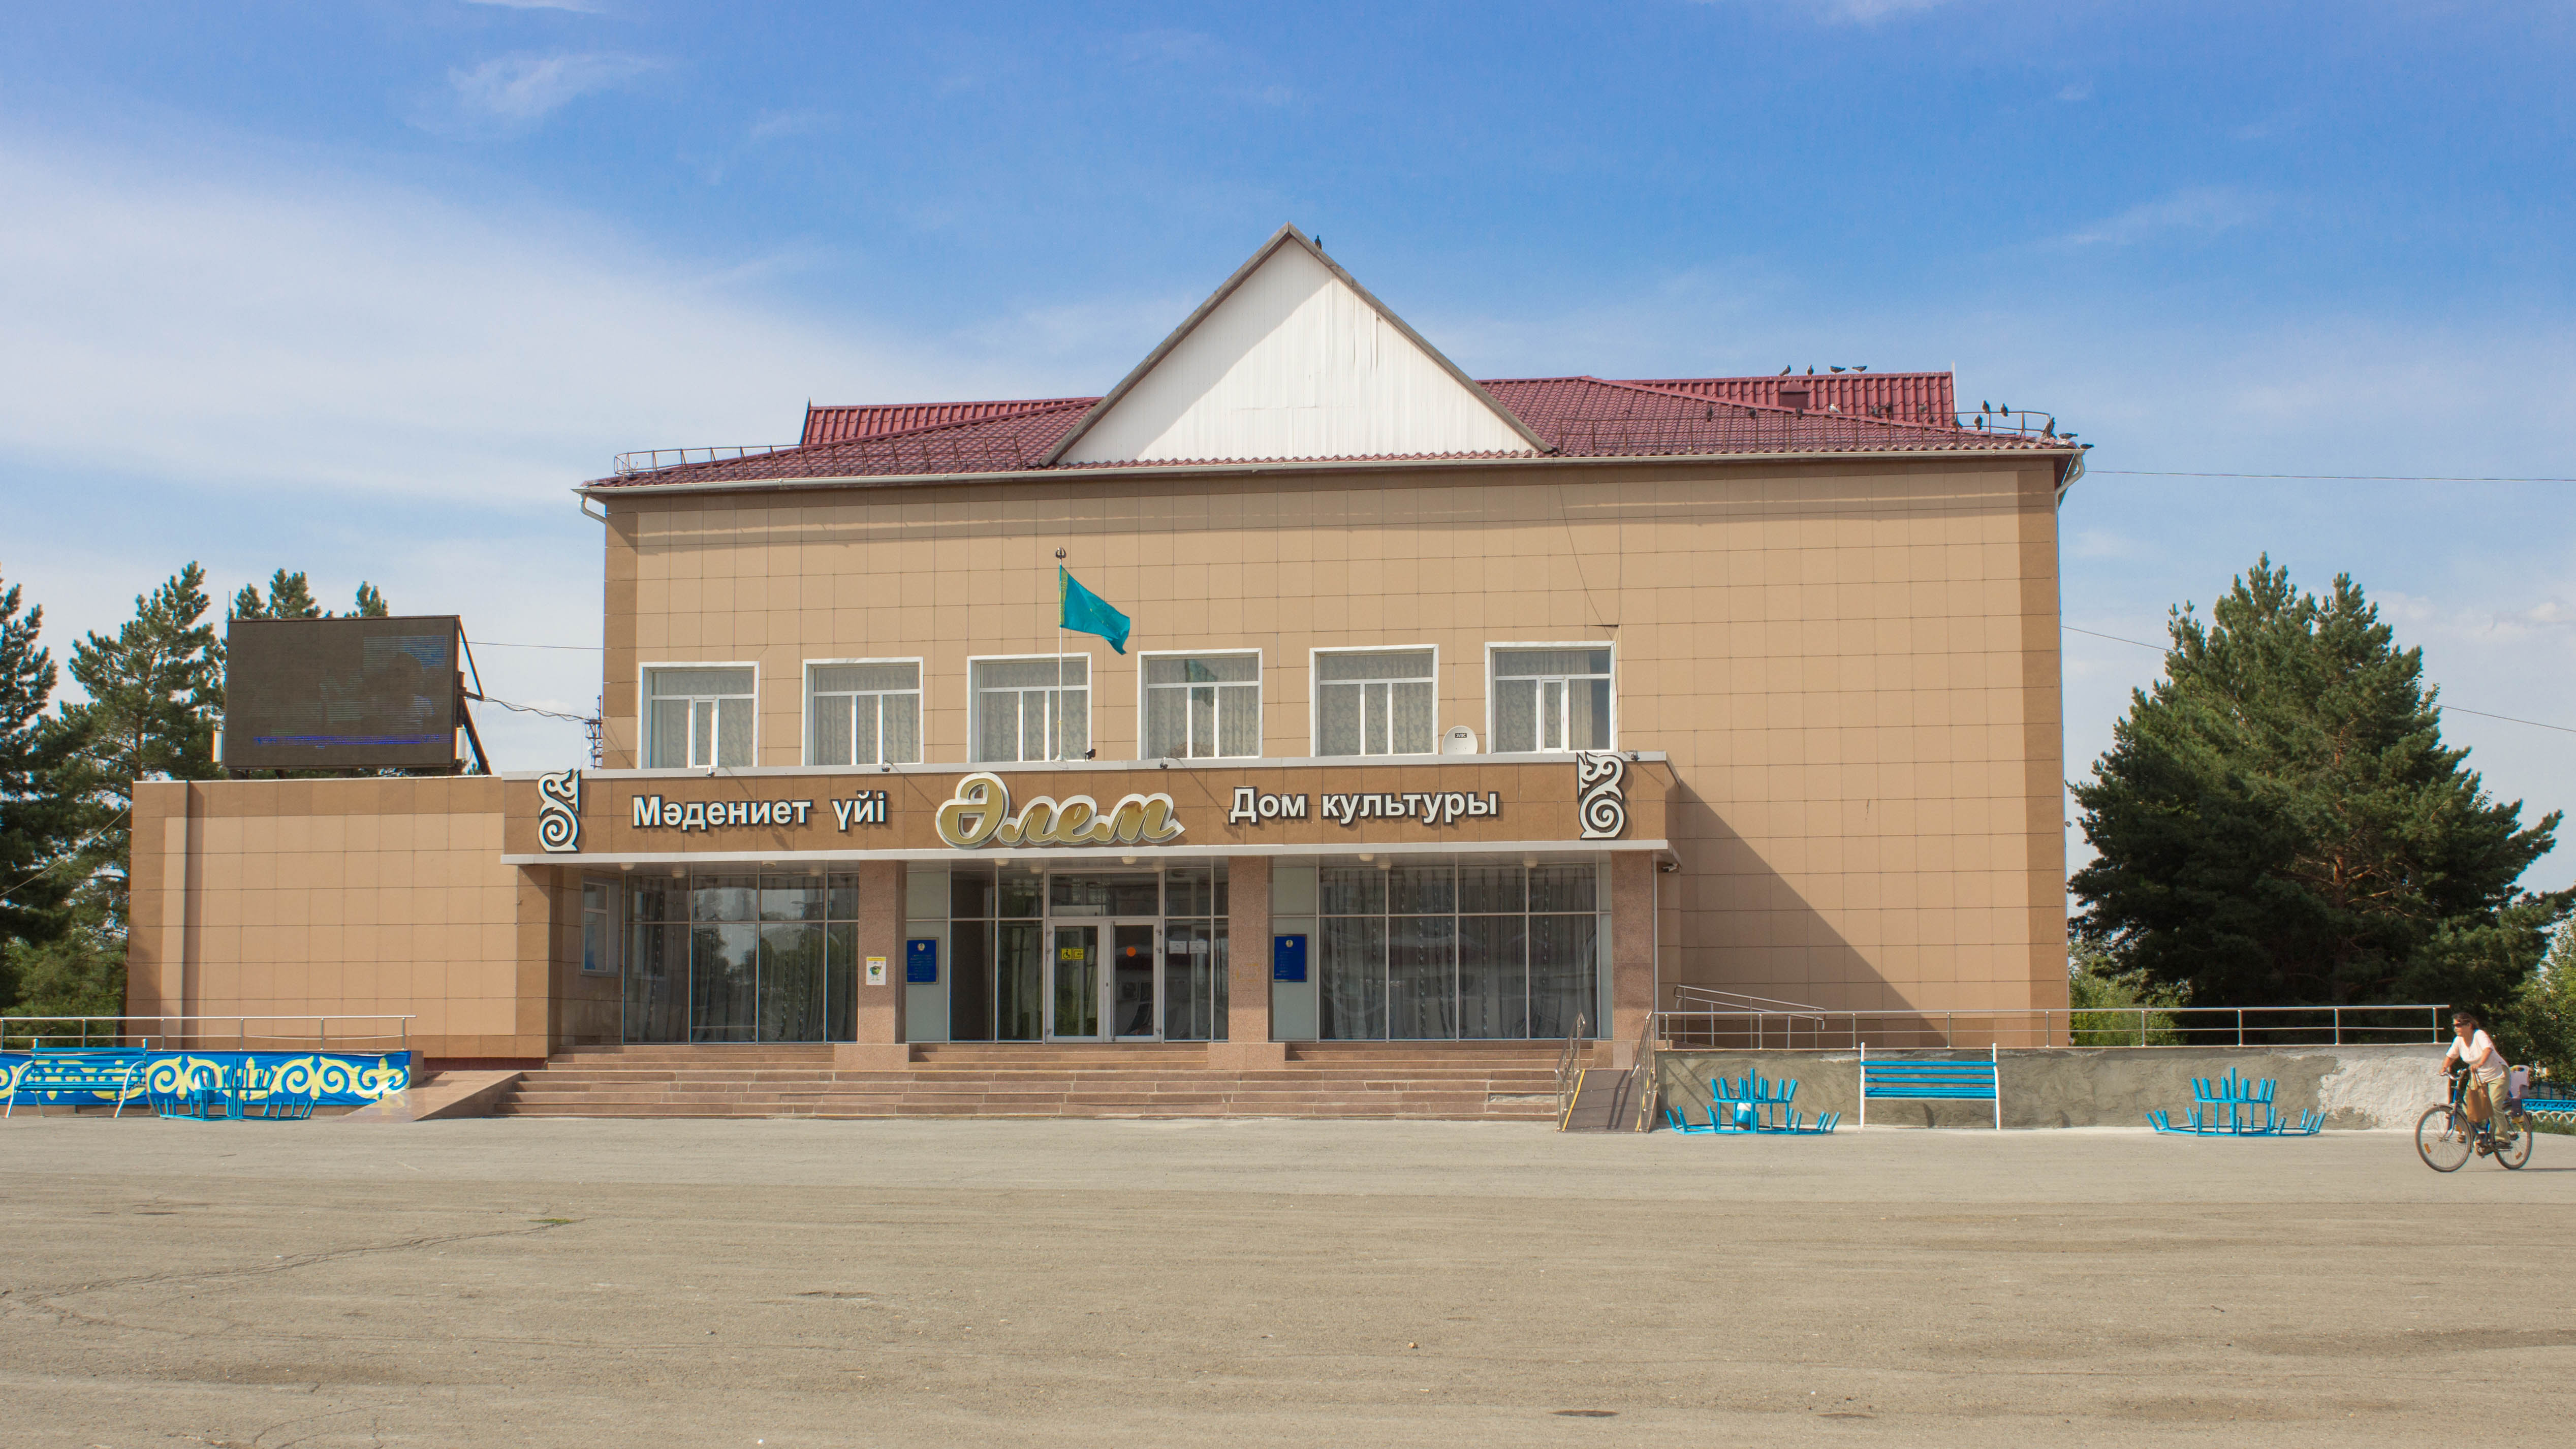 Денисовка 07 2017